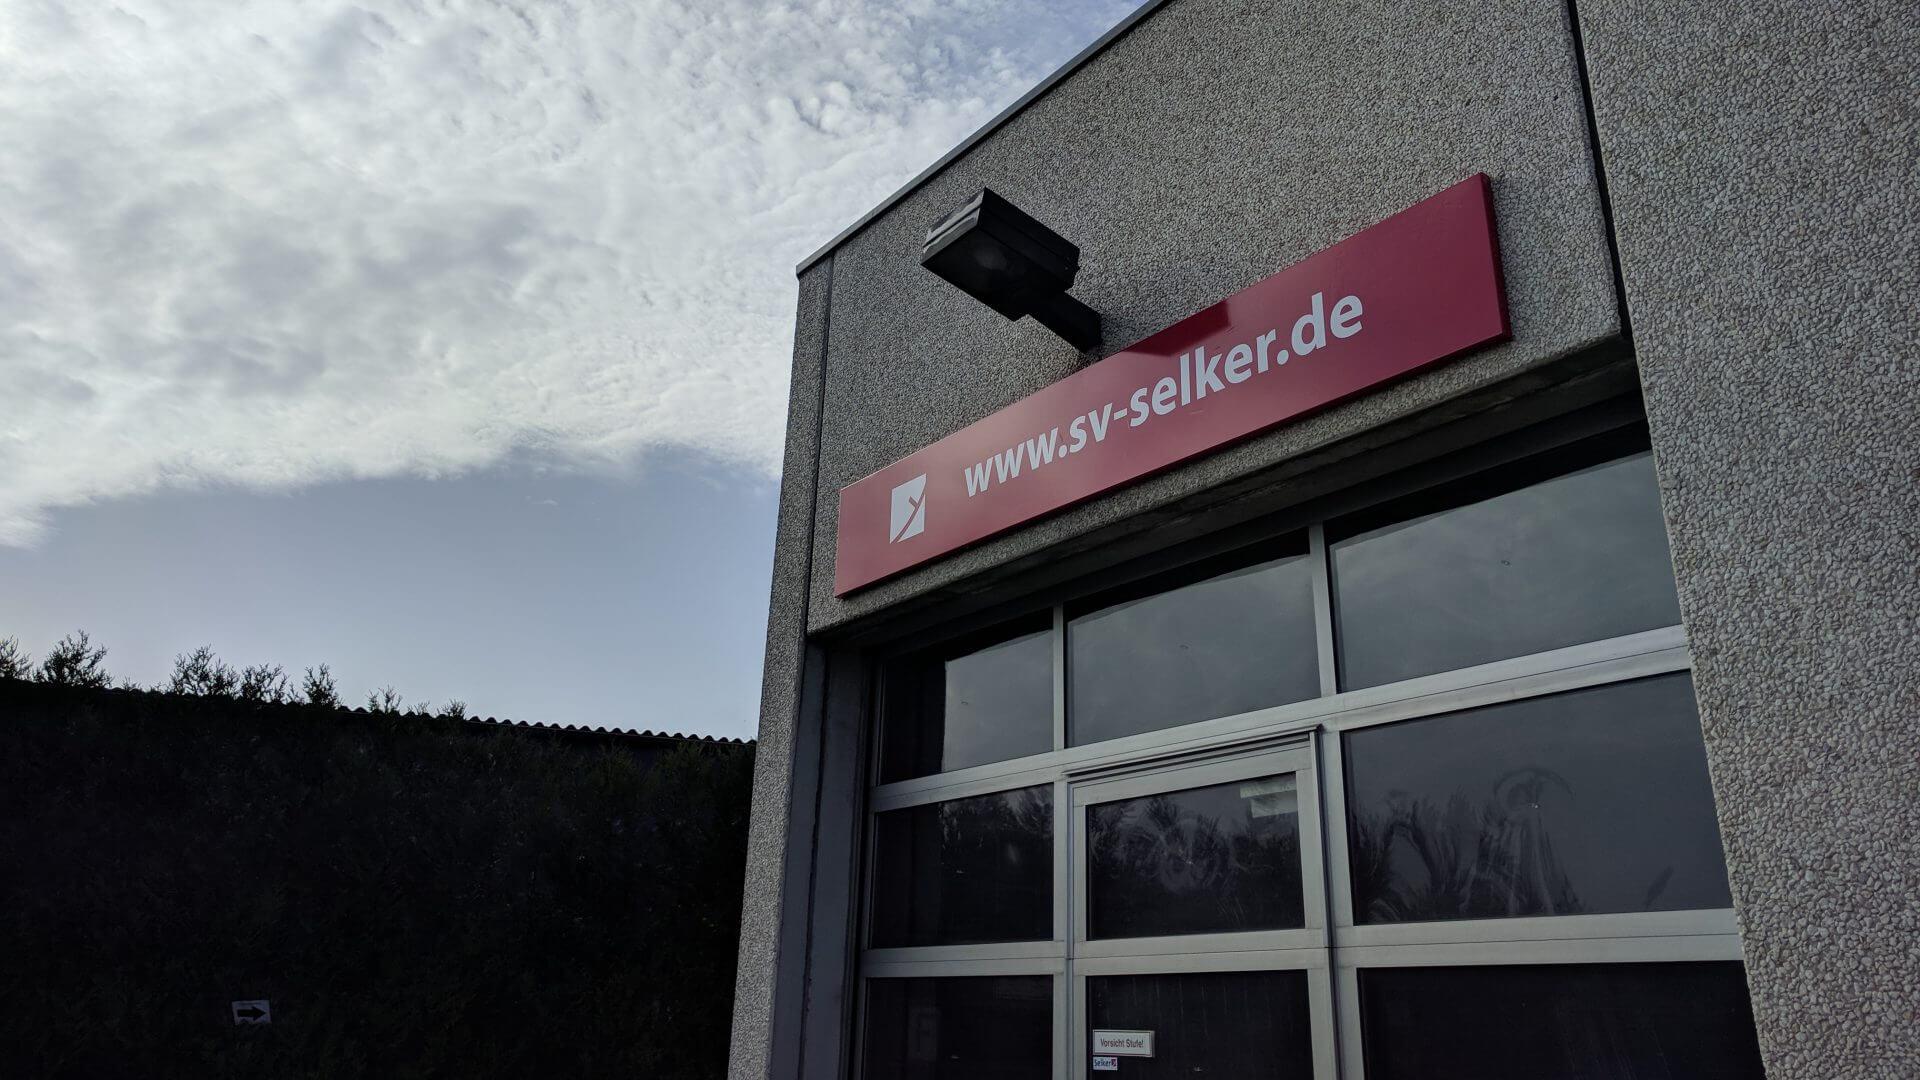 SV-Büro Selker (KÜS)